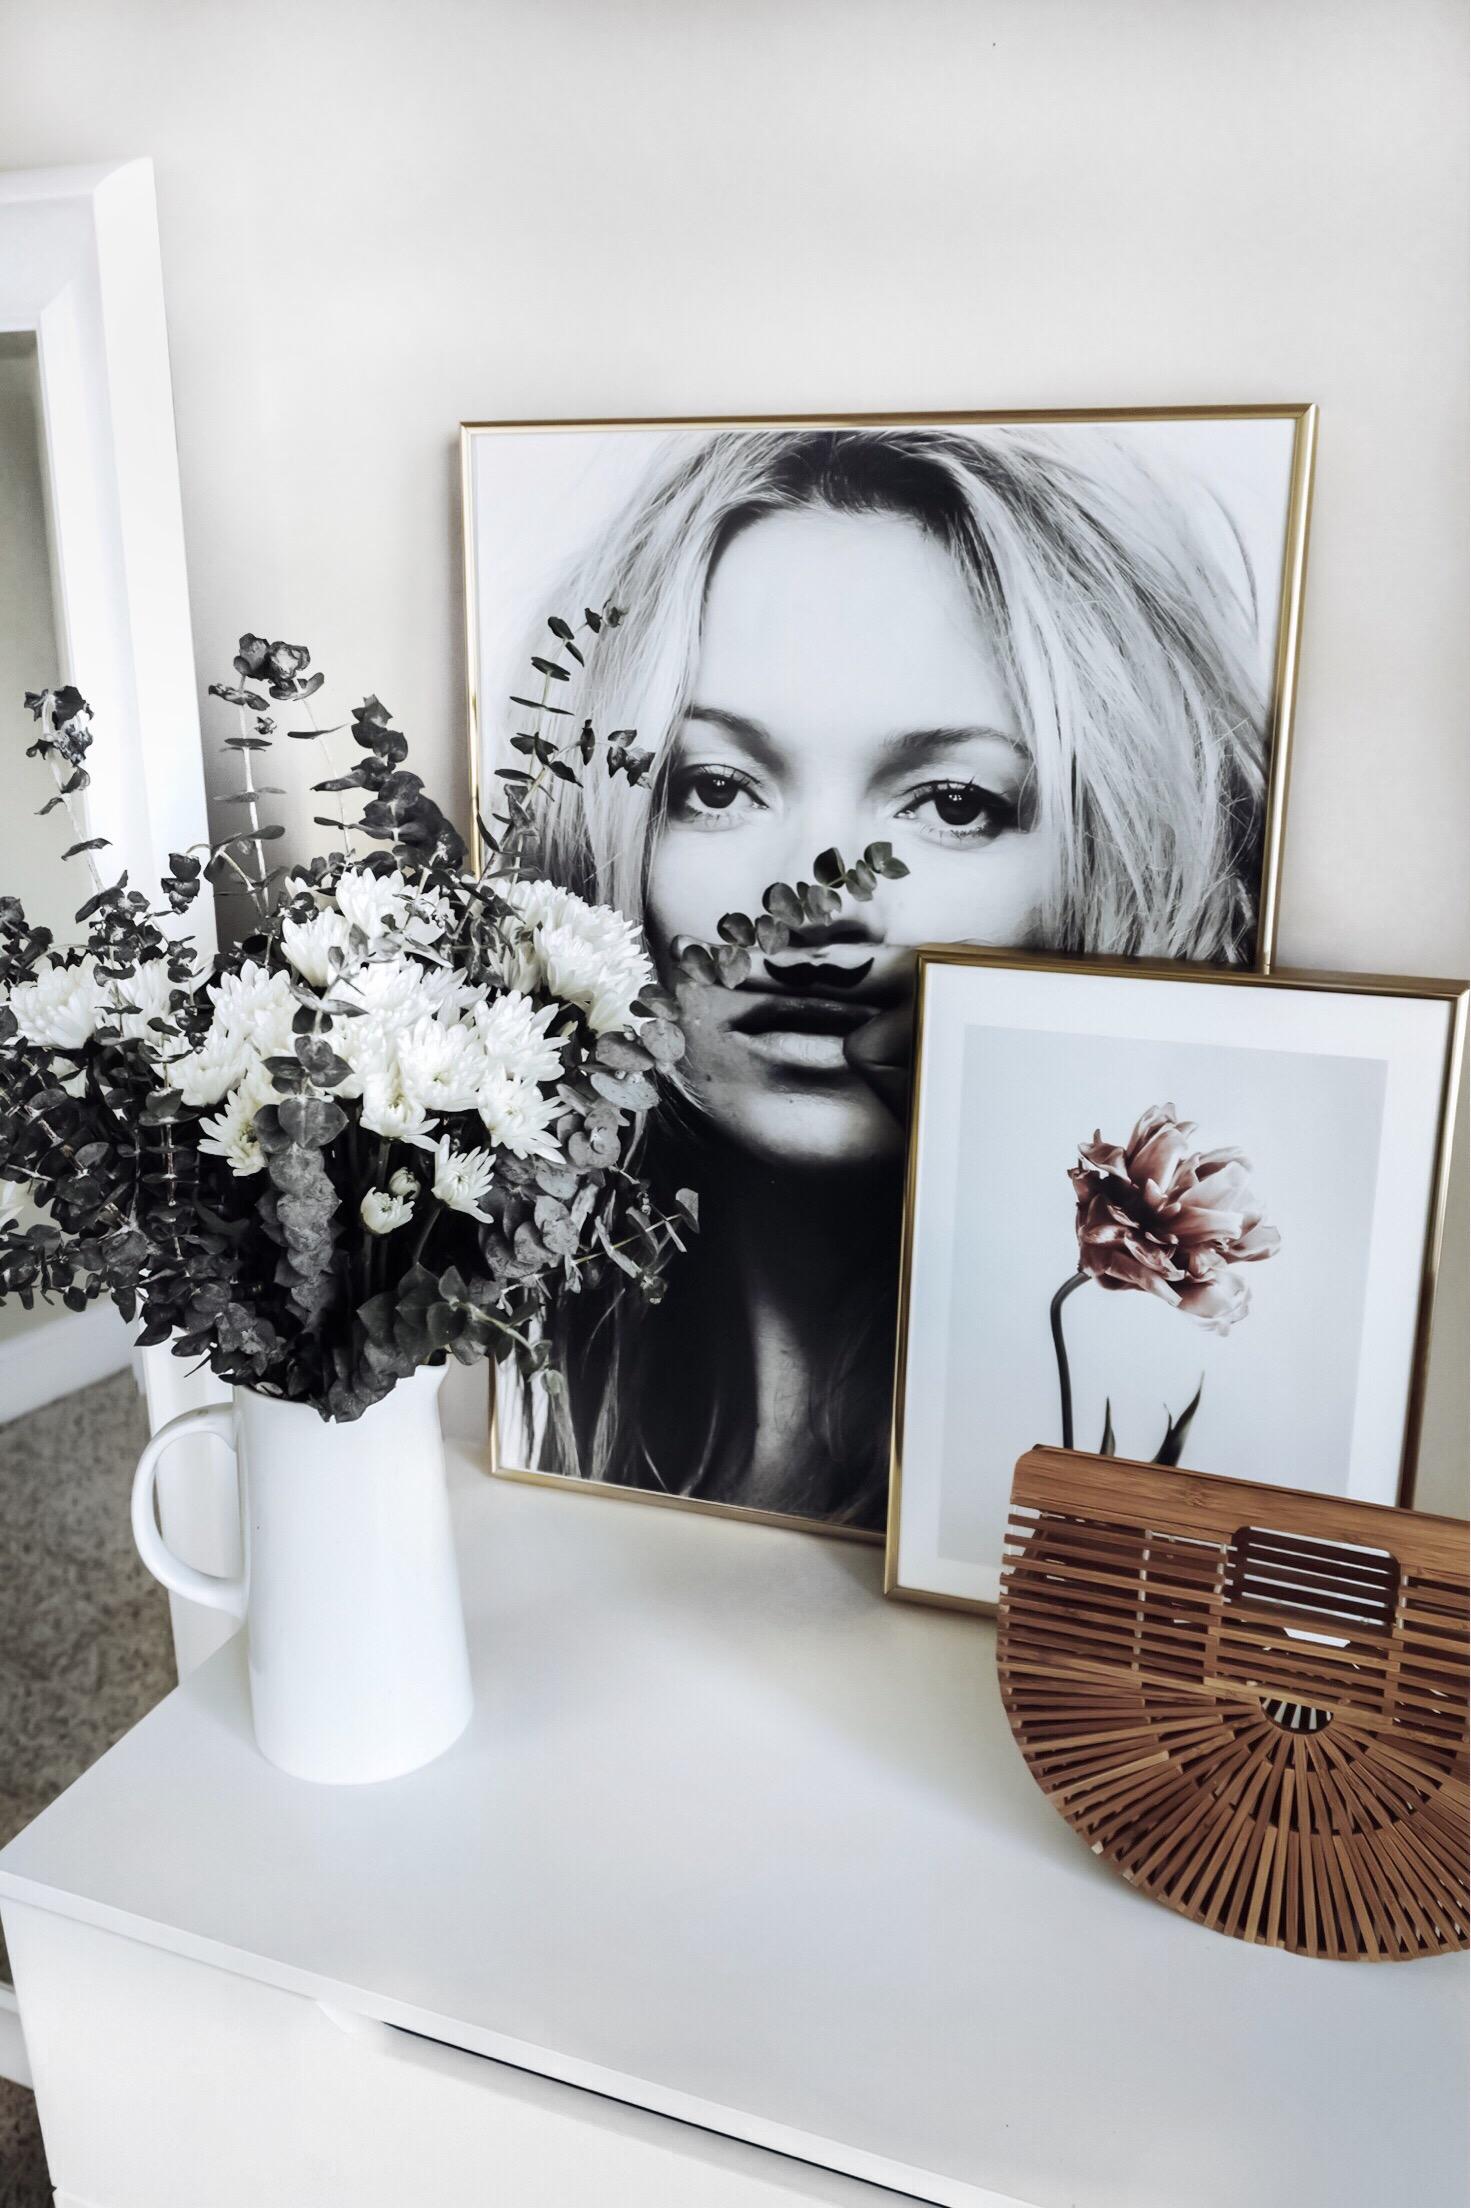 Tiffany Jais Houston fashion and lifestyle blogger | Friday feels | Deseno art prints Kate Moss, Life is a joke print | Pink Tulip Print |